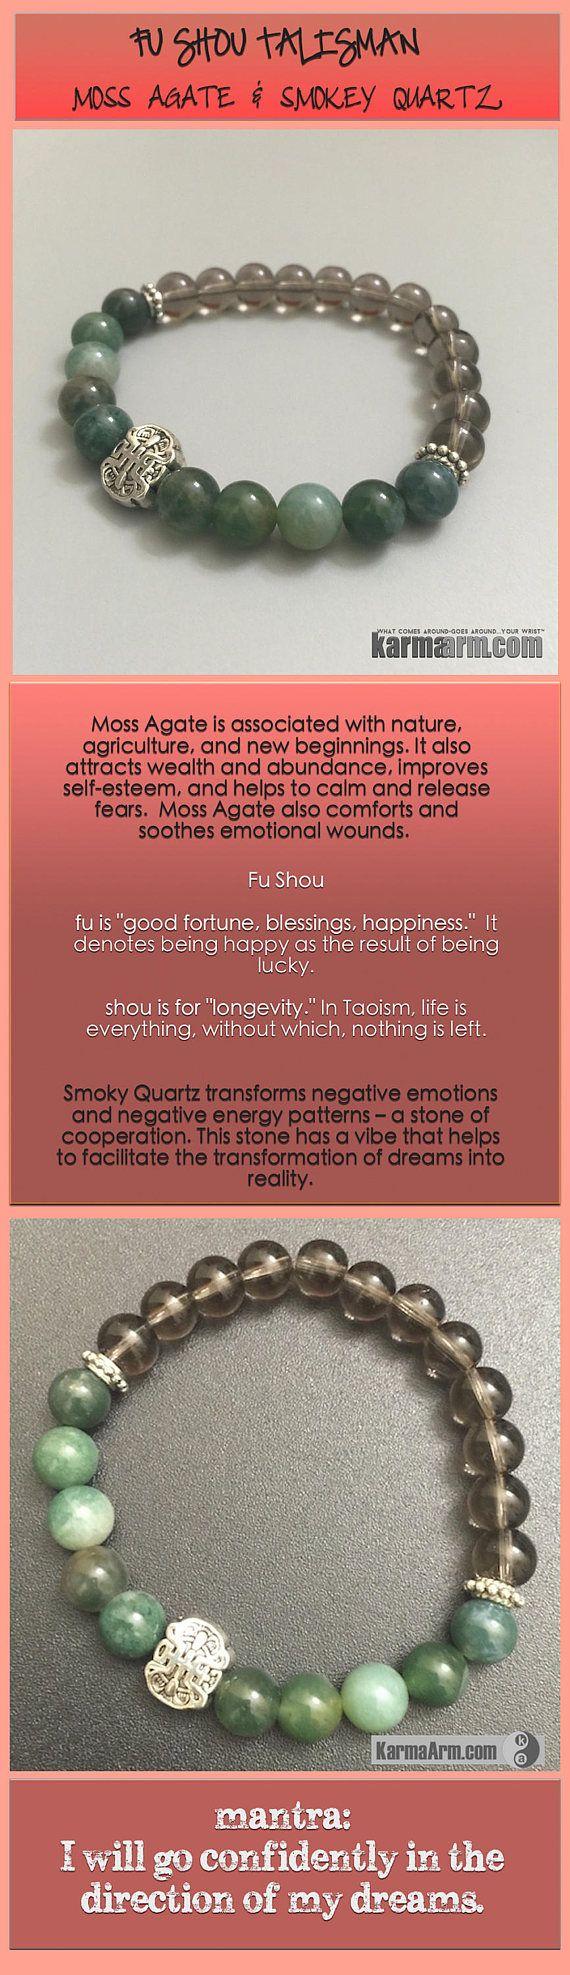 Green Moss Agate attracts #wealth and #abundance, improves #self-esteem, and helps to #calm and release fears. #Green #Moss #Agate #Smokey#Smoky #Quartz    #Beaded #Beads #giftsforhim #Bracelet #Bracelets #Buddhist #Chakra #Charm #Crystals #Energy #gifts #Handmade #Healing #Jewelry #Kundalini #LawOfAttraction #LOA #Love #Mala #Meditation #Mens #prayer #Reiki #Spiritual #Stacks #Stretch #Womens #Yoga #YogaBracelets #fertility #wisdom #Lucky